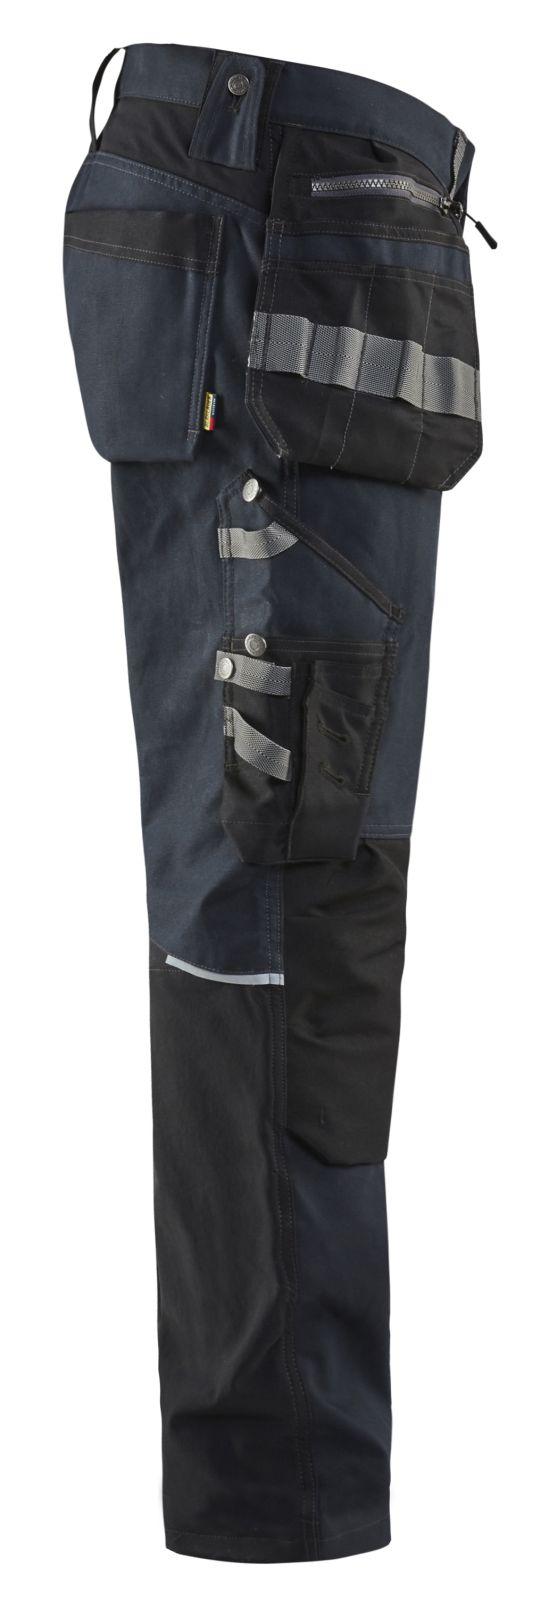 Blaklader Broeken 15991343 donker marineblauw-zwart(8699)